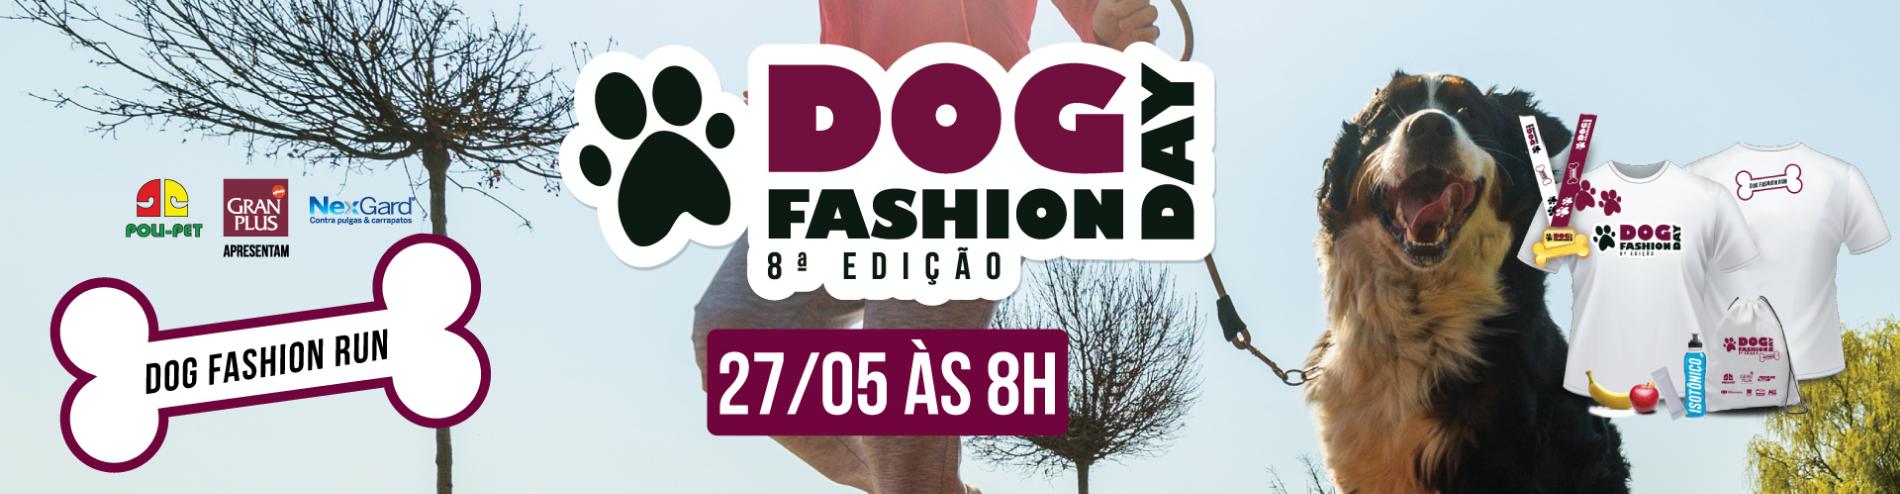 DOG FASHION RUN 2018 - Imagem de topo